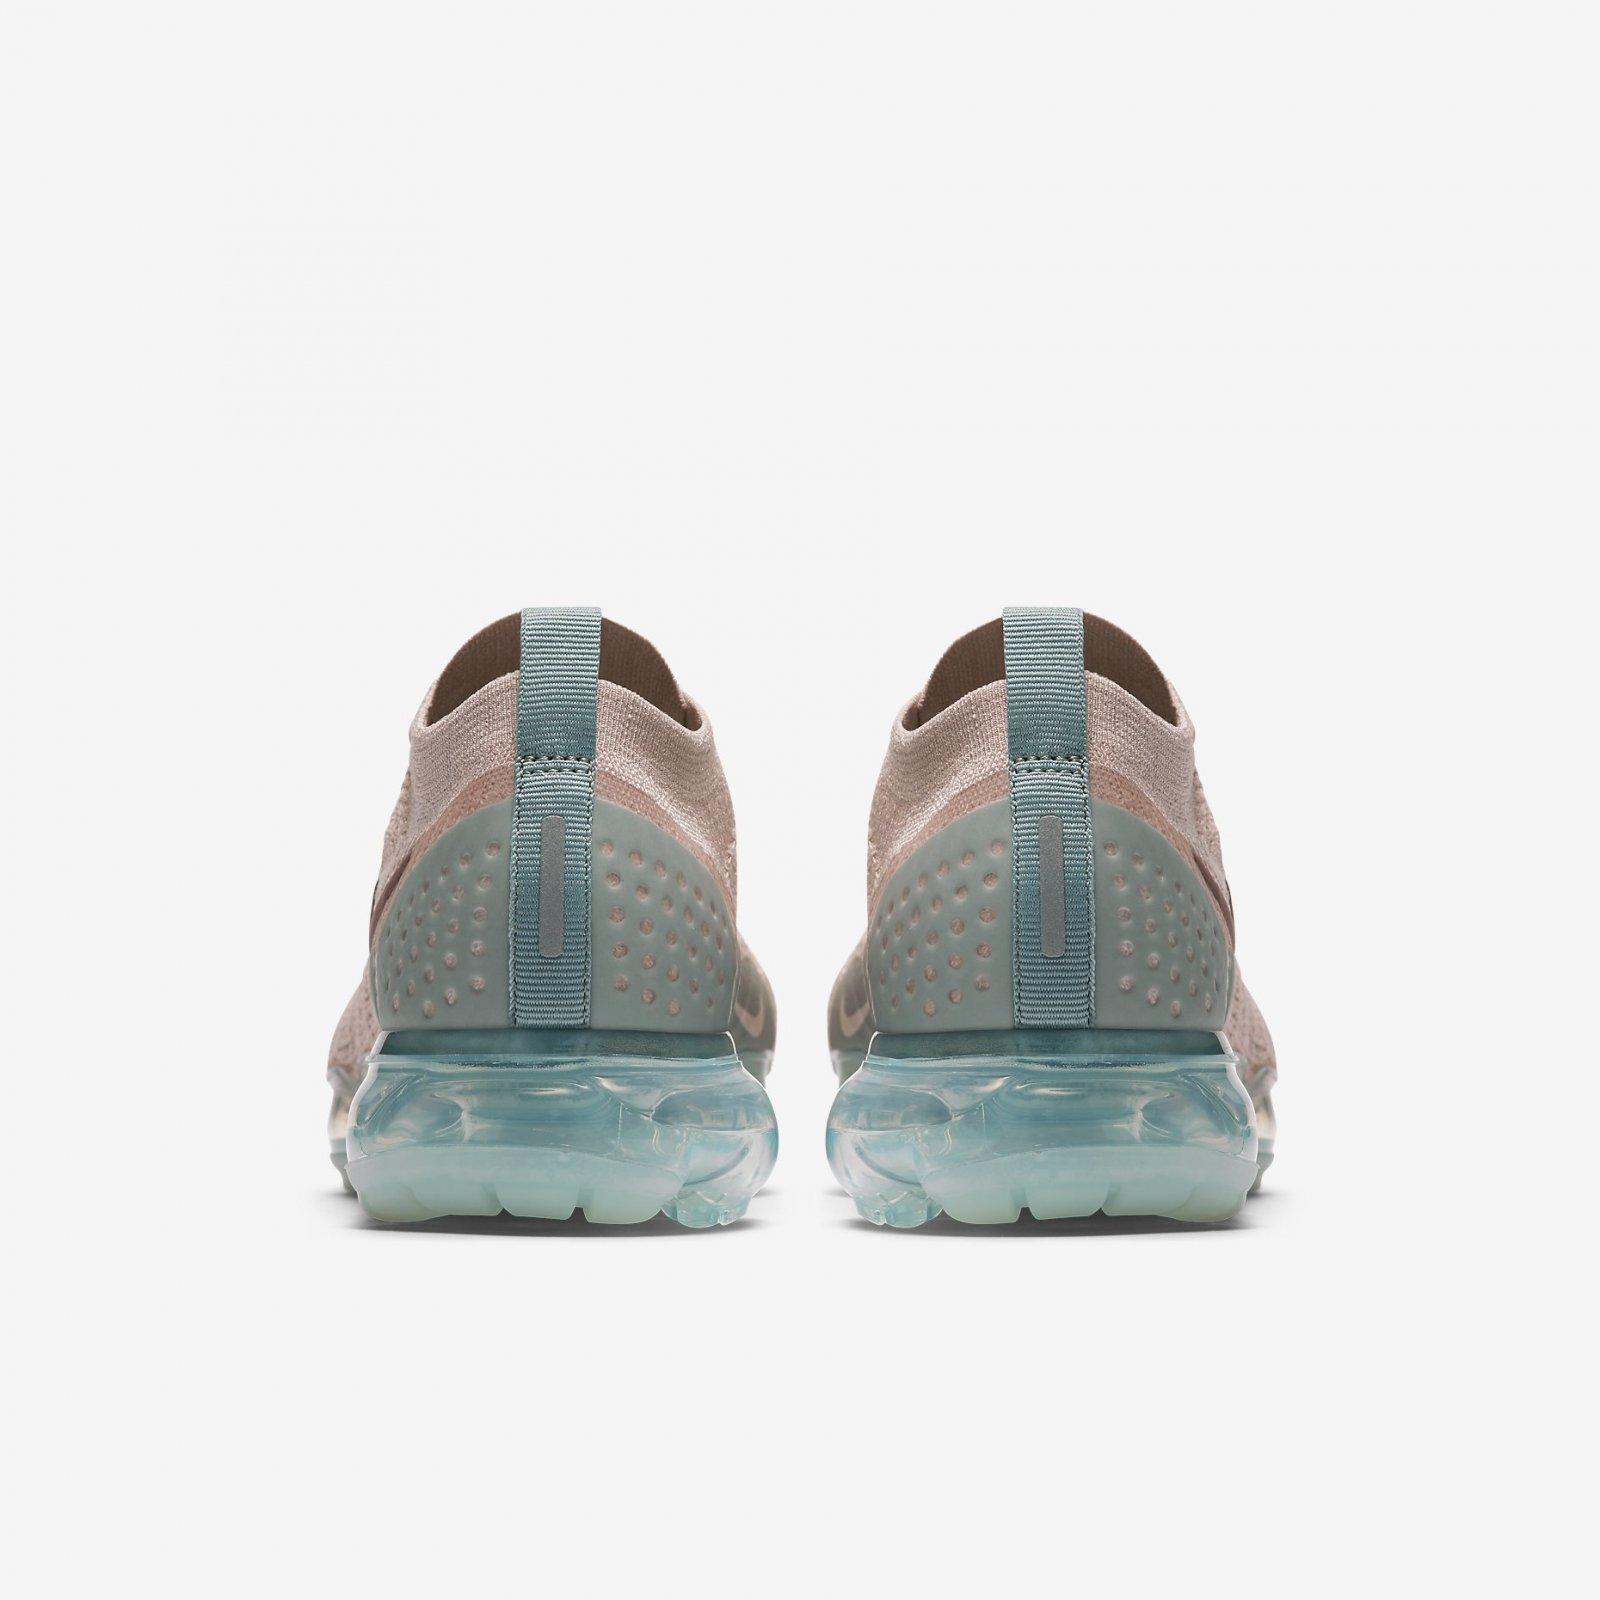 2197372c9468 Nike Women s Air VaporMax Flyknit 2 Particle Beige Mauve Running Shoe  942843-203. Nike